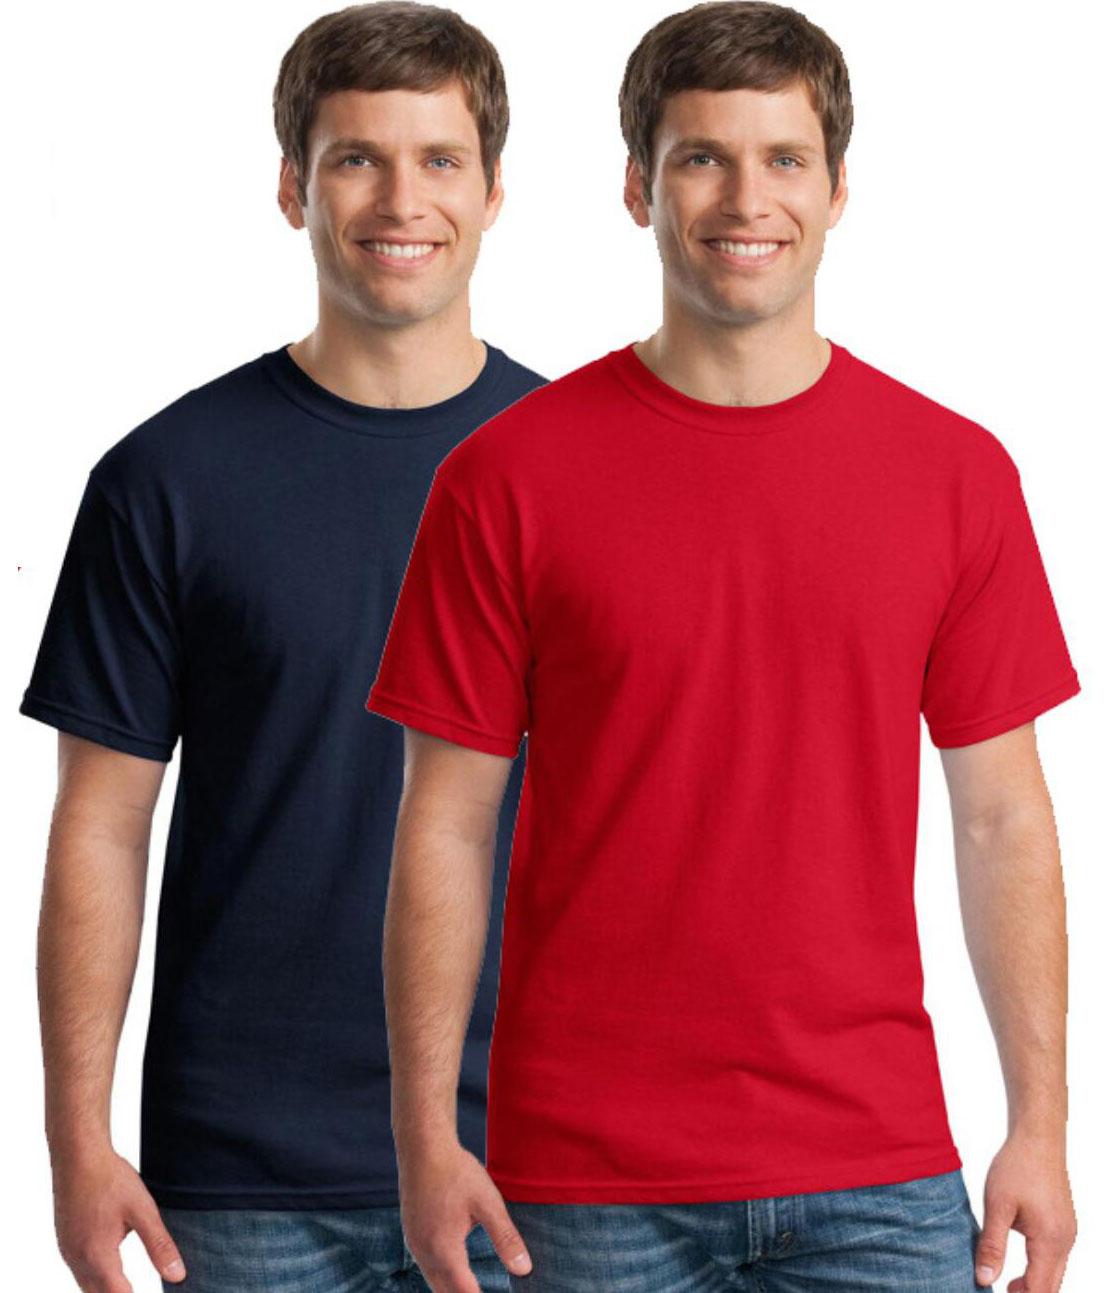 Hemp Clothing Superdry Shirt Tshirts With Logo Printed White Shirts Custom Printing T Shirt 100 Cotton For Men Buy T Shirt 100 Cotton Cotton T Shirt Custom T Shirt Printing Product On Alibaba Com